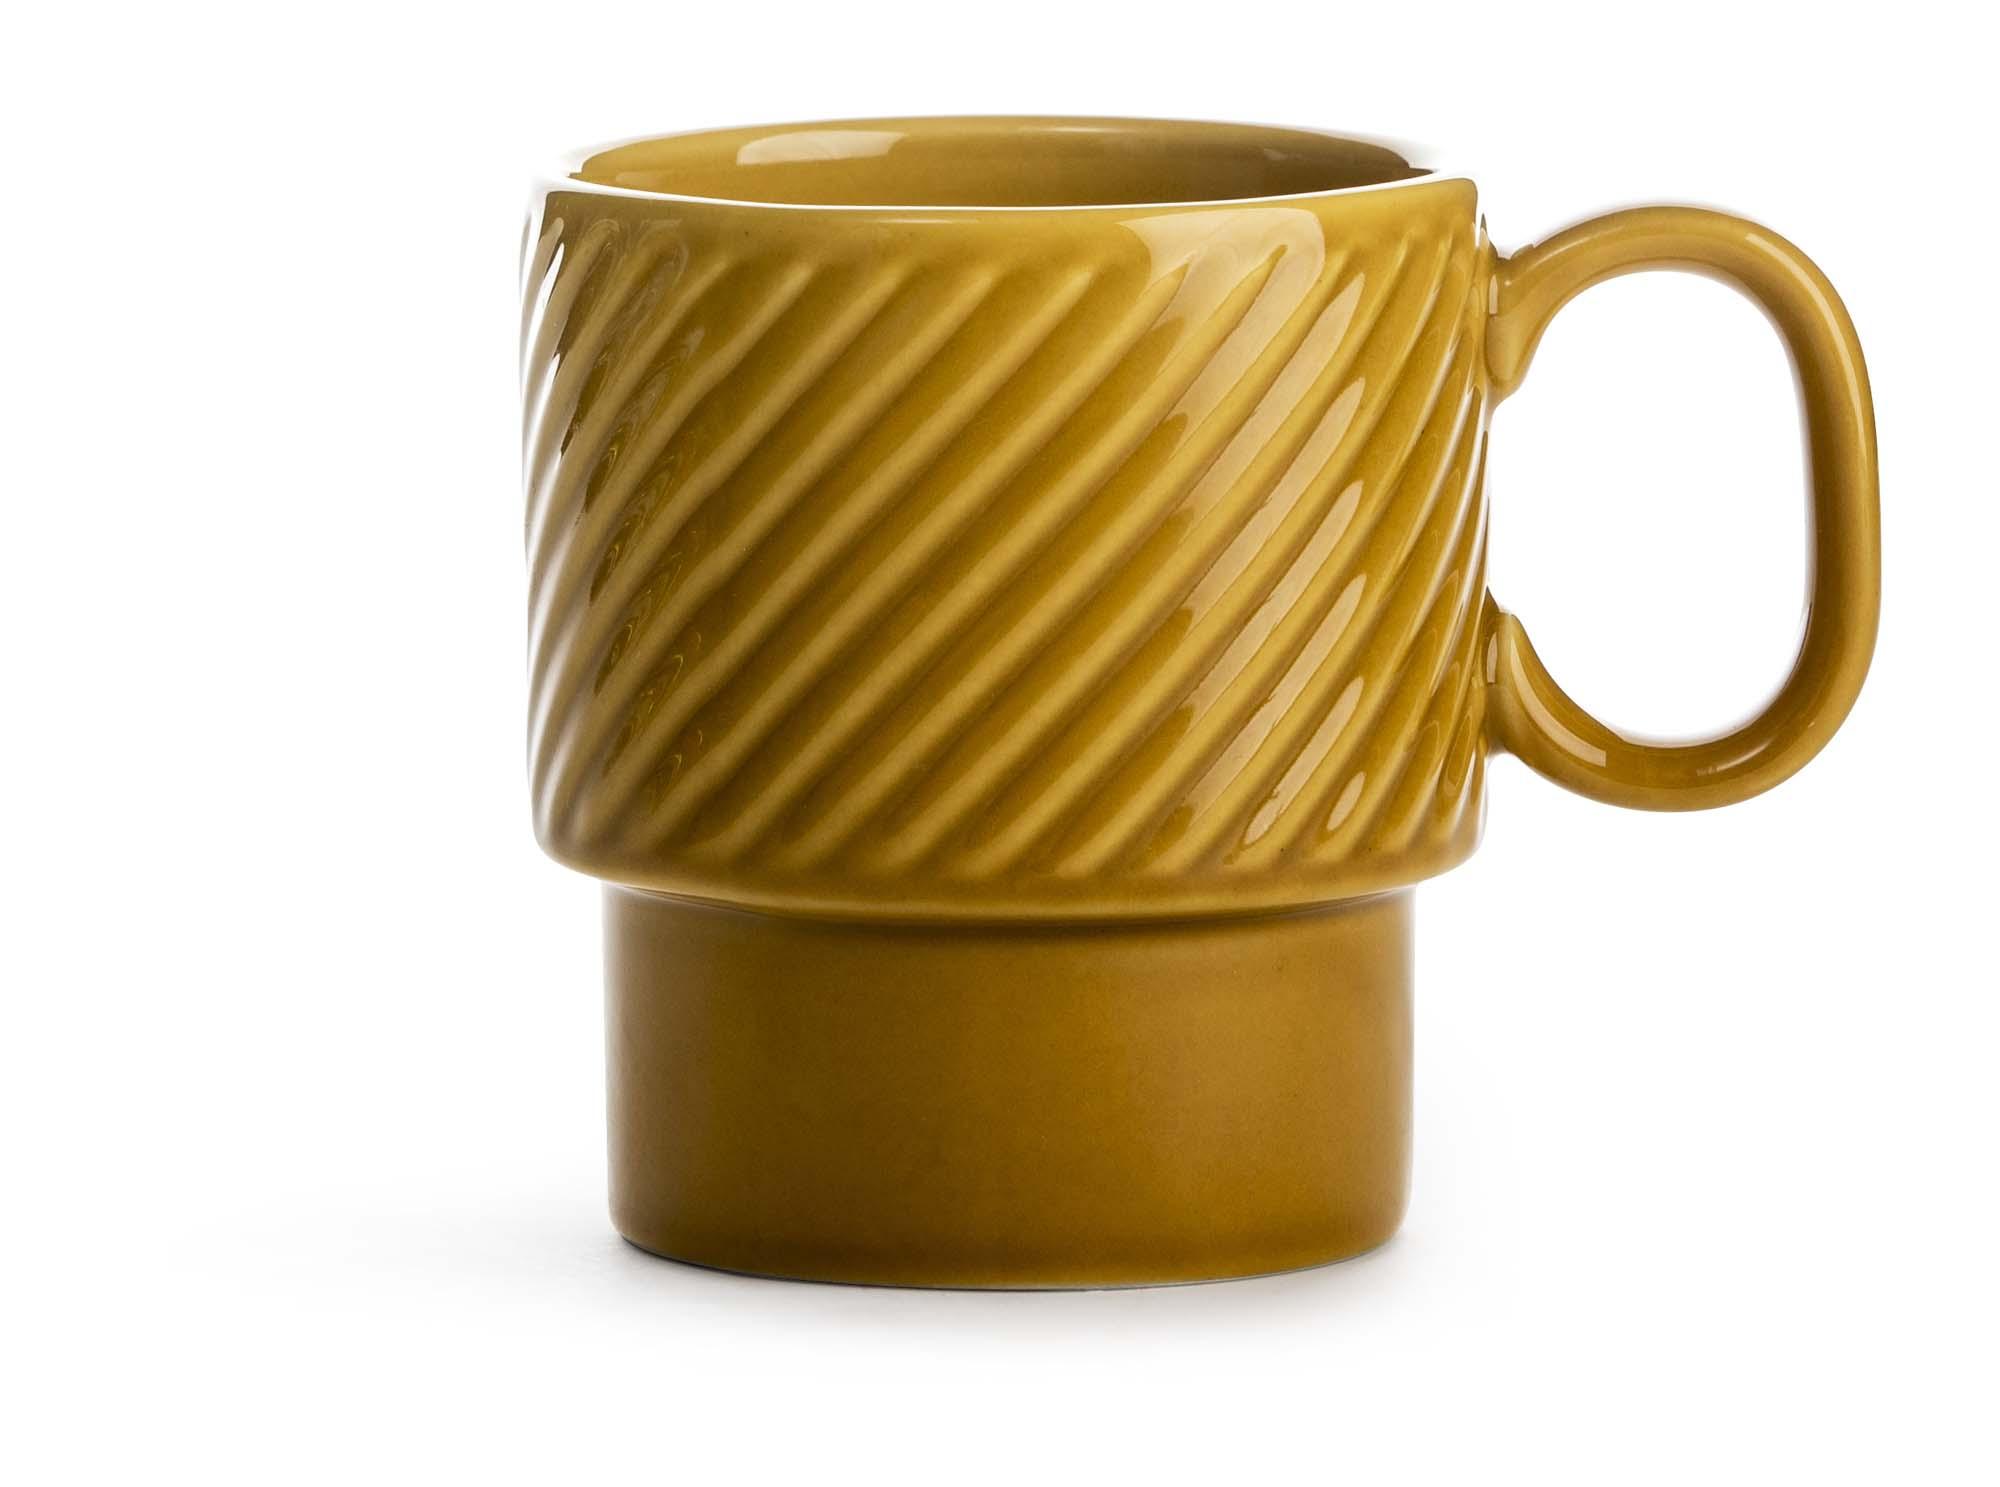 Sagaform Coffee & More kaffekrus gul